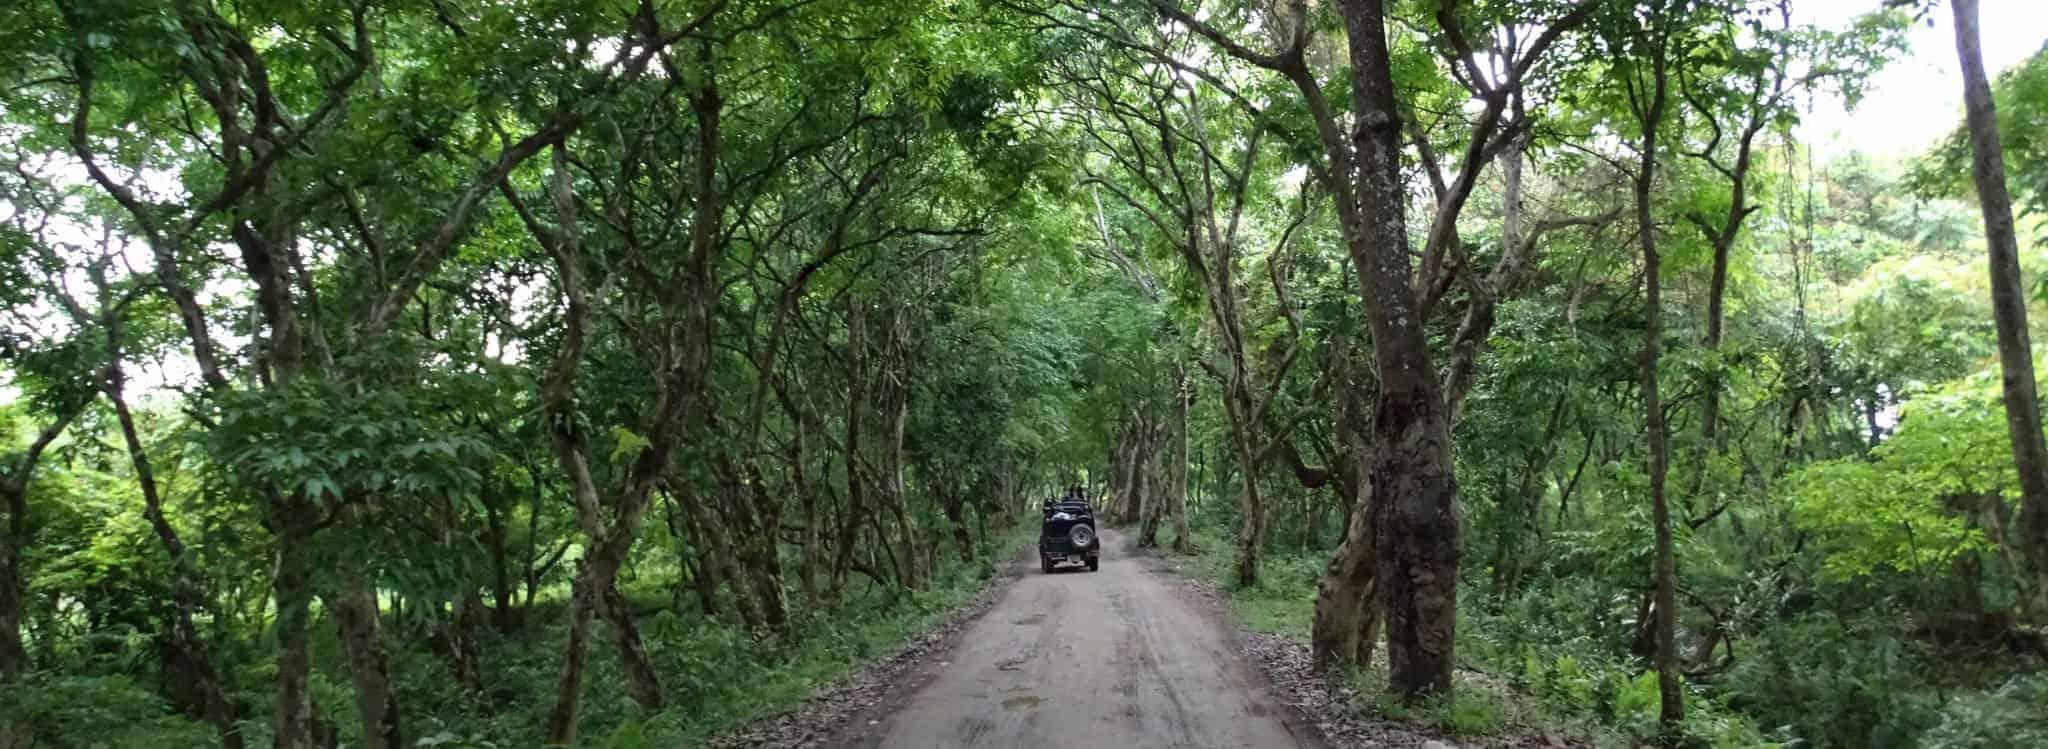 Wildlife trip to the Kaziranga National Park